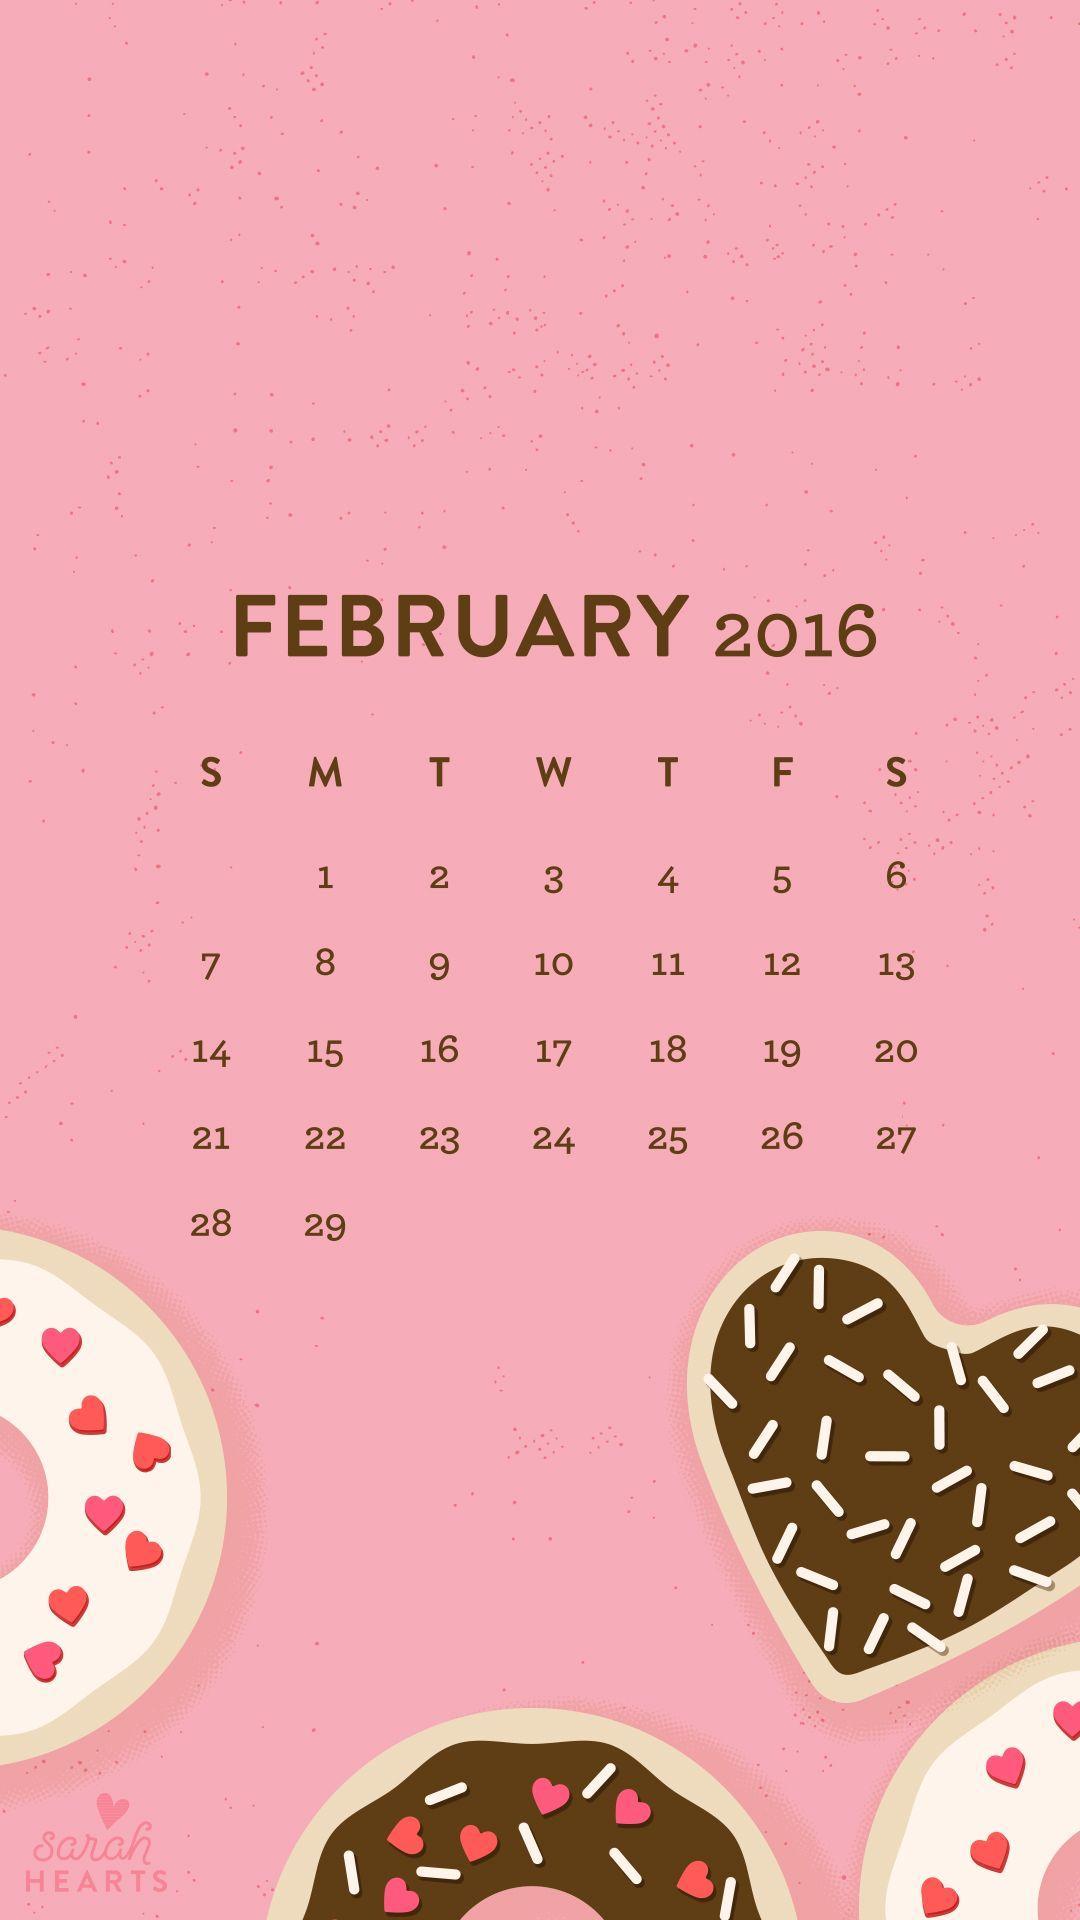 Donut Wallpaper Cute February 2016 Wallpapers Calendar Wallpaper Cave